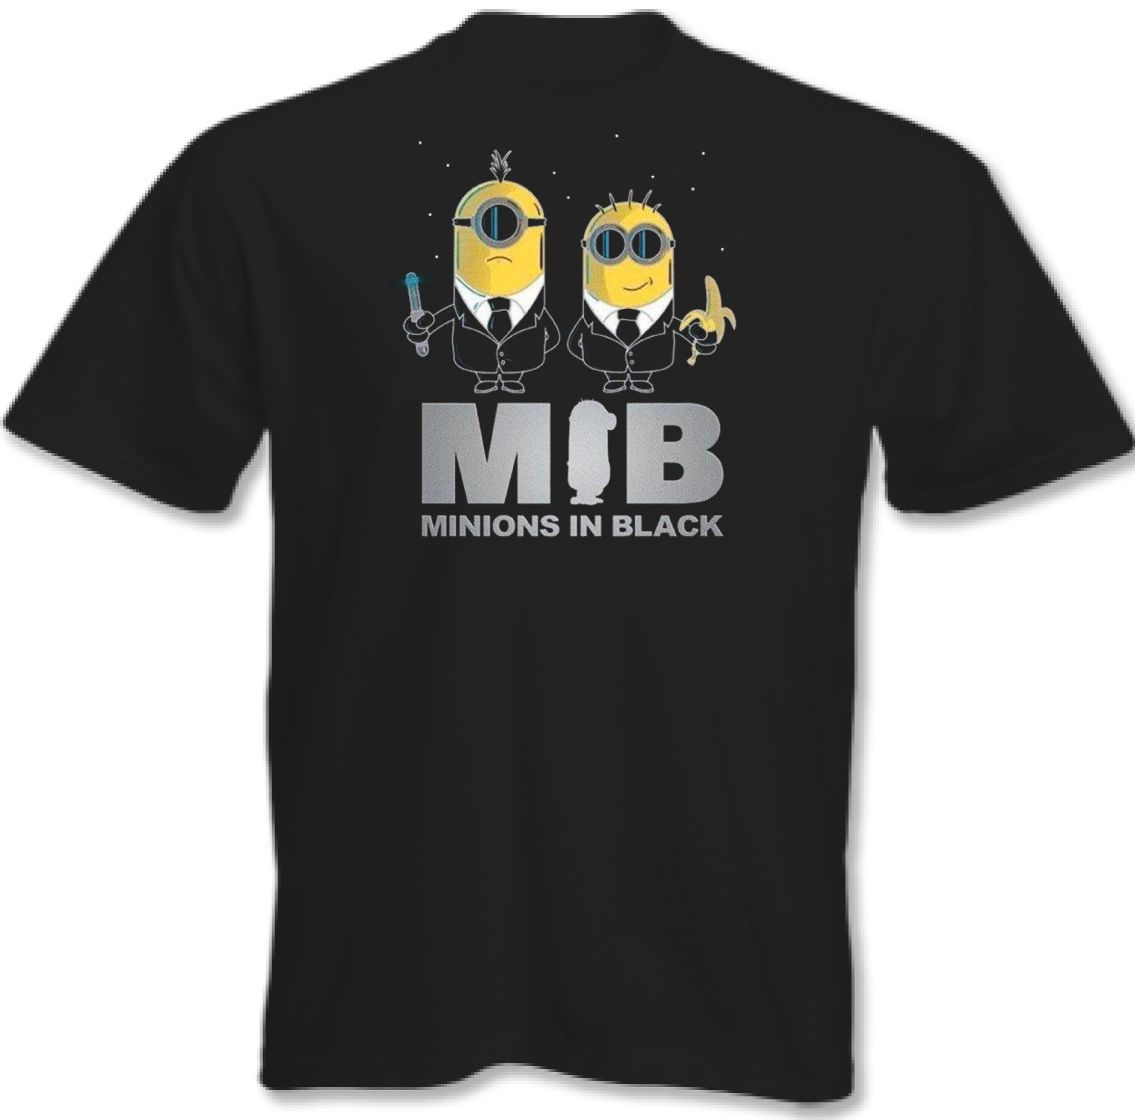 d061af6c Minions In Black - Mens Funny T-Shirt - Parody 3XL 4XL 5XL | Minions ...